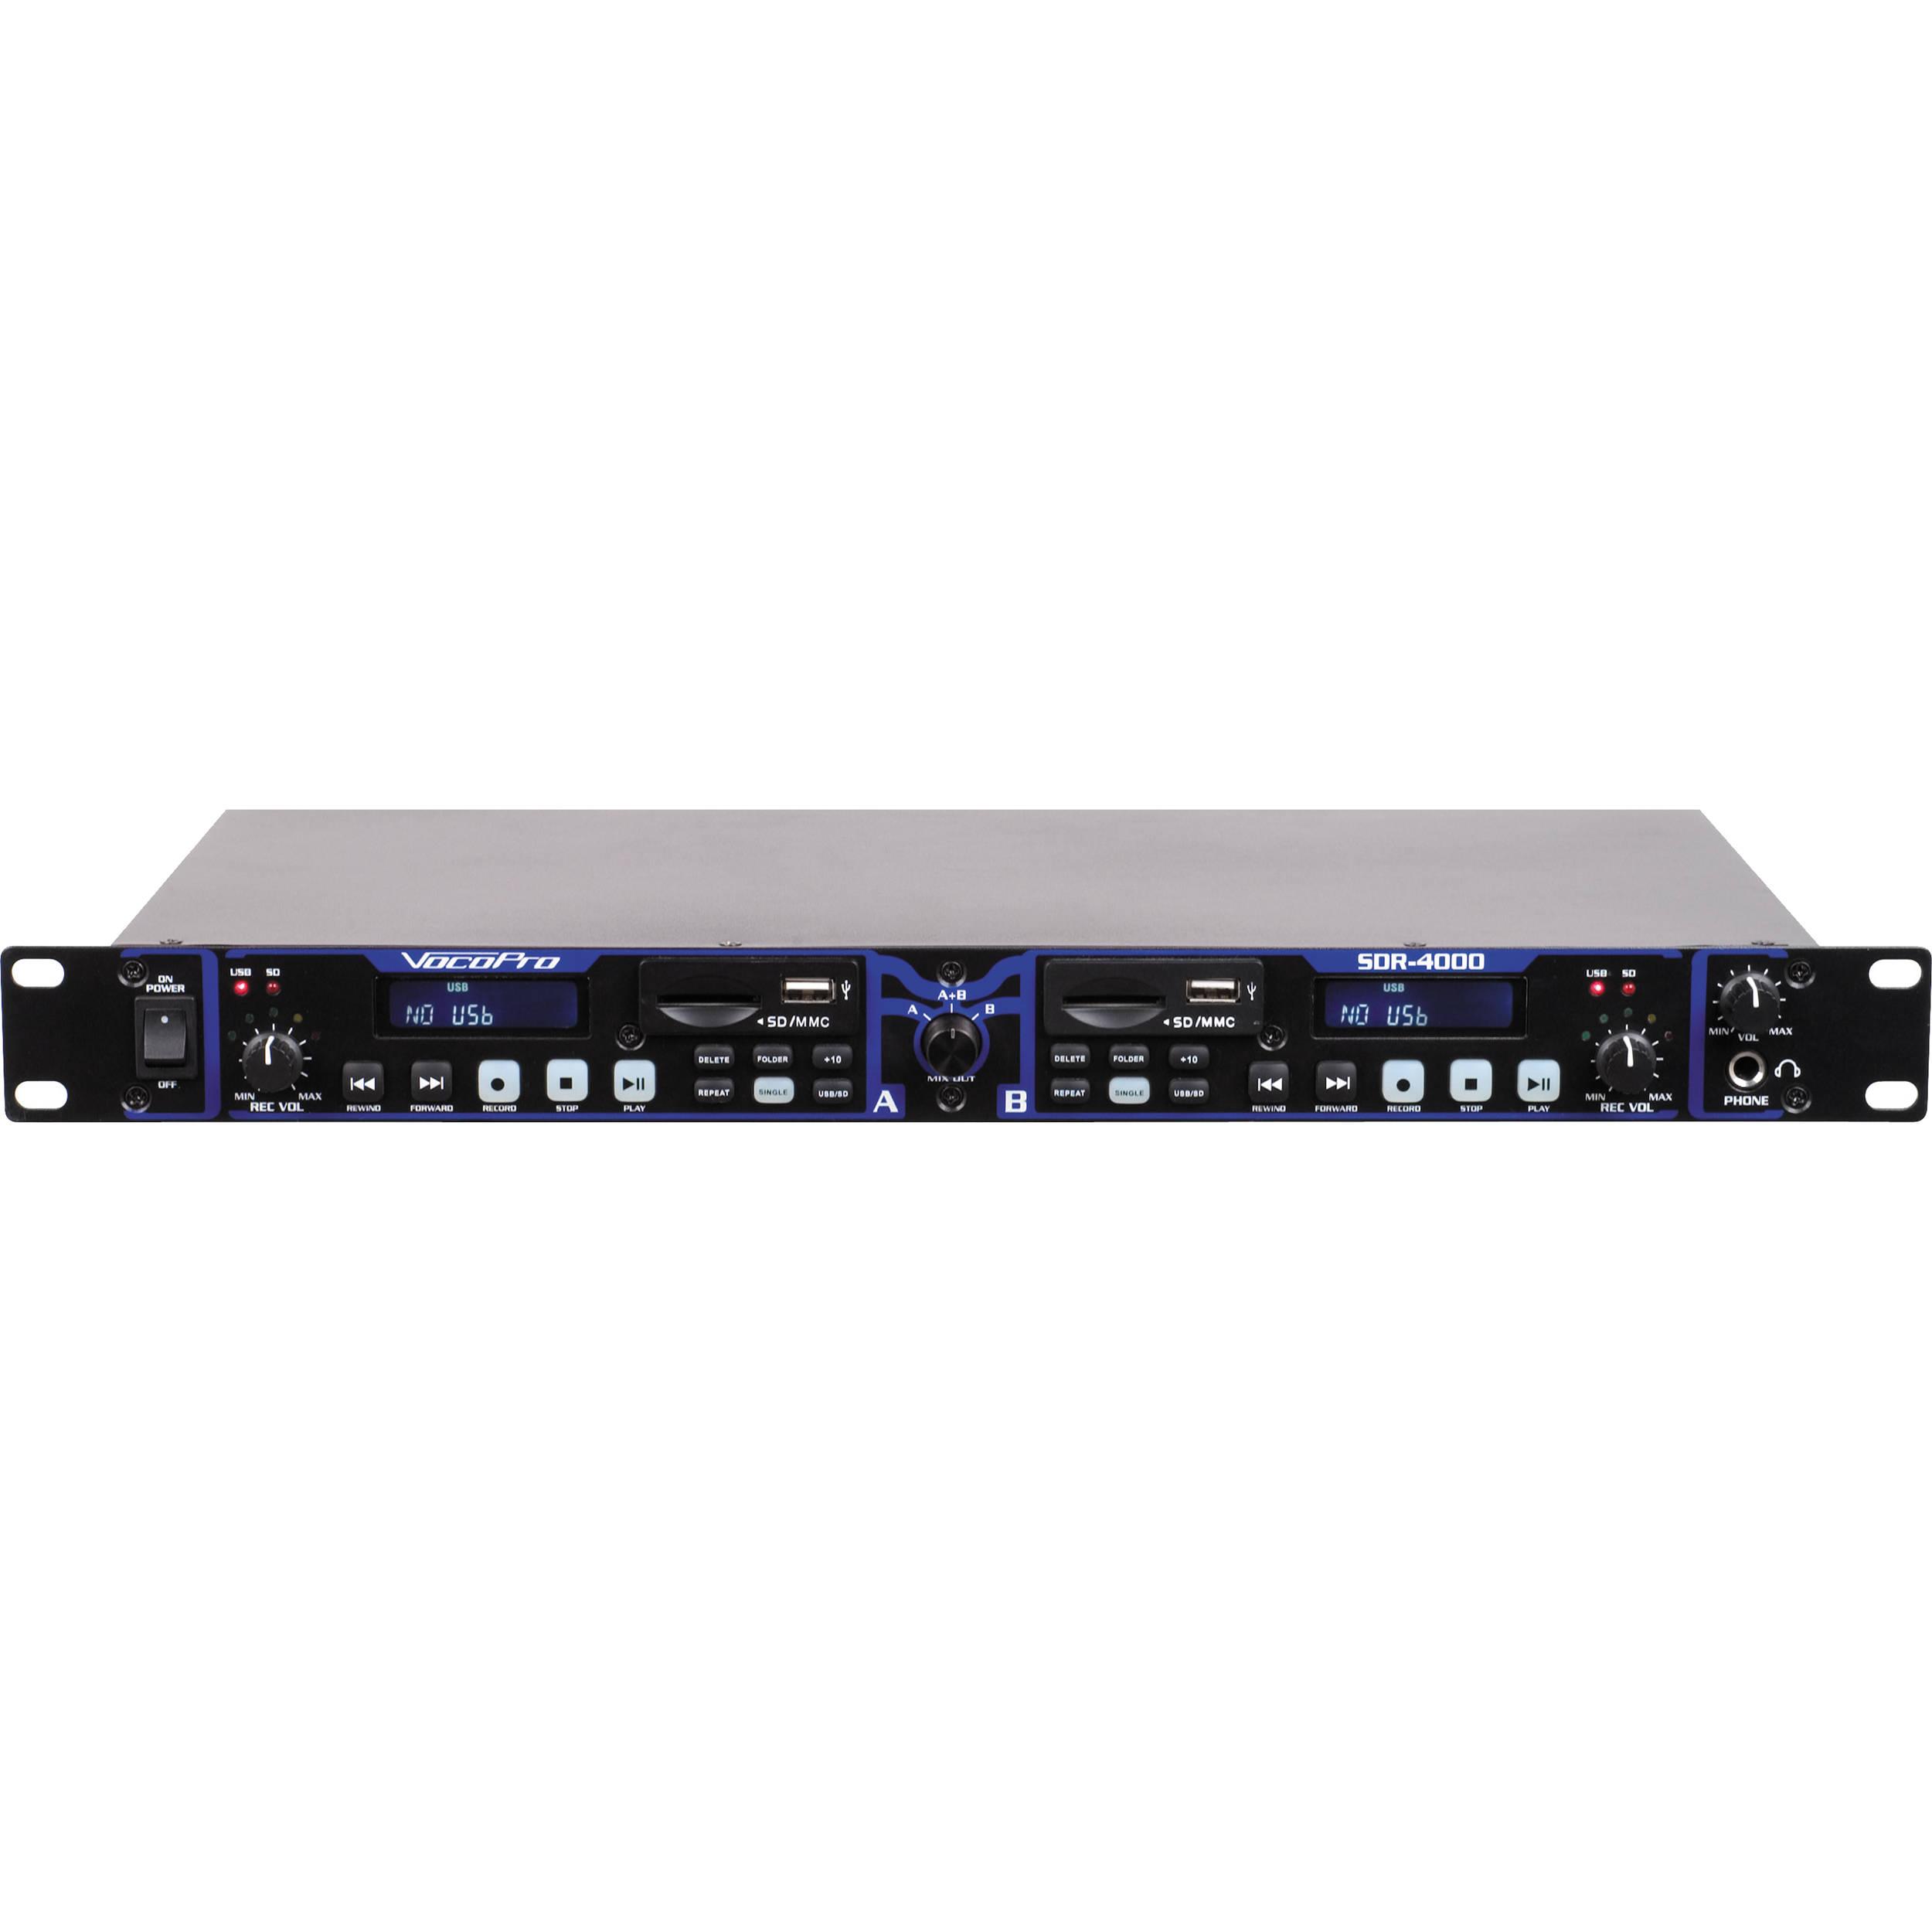 Vocopro Sdr 4000 Dual Digital Usb Sd Audio Recorder Sdr 4000